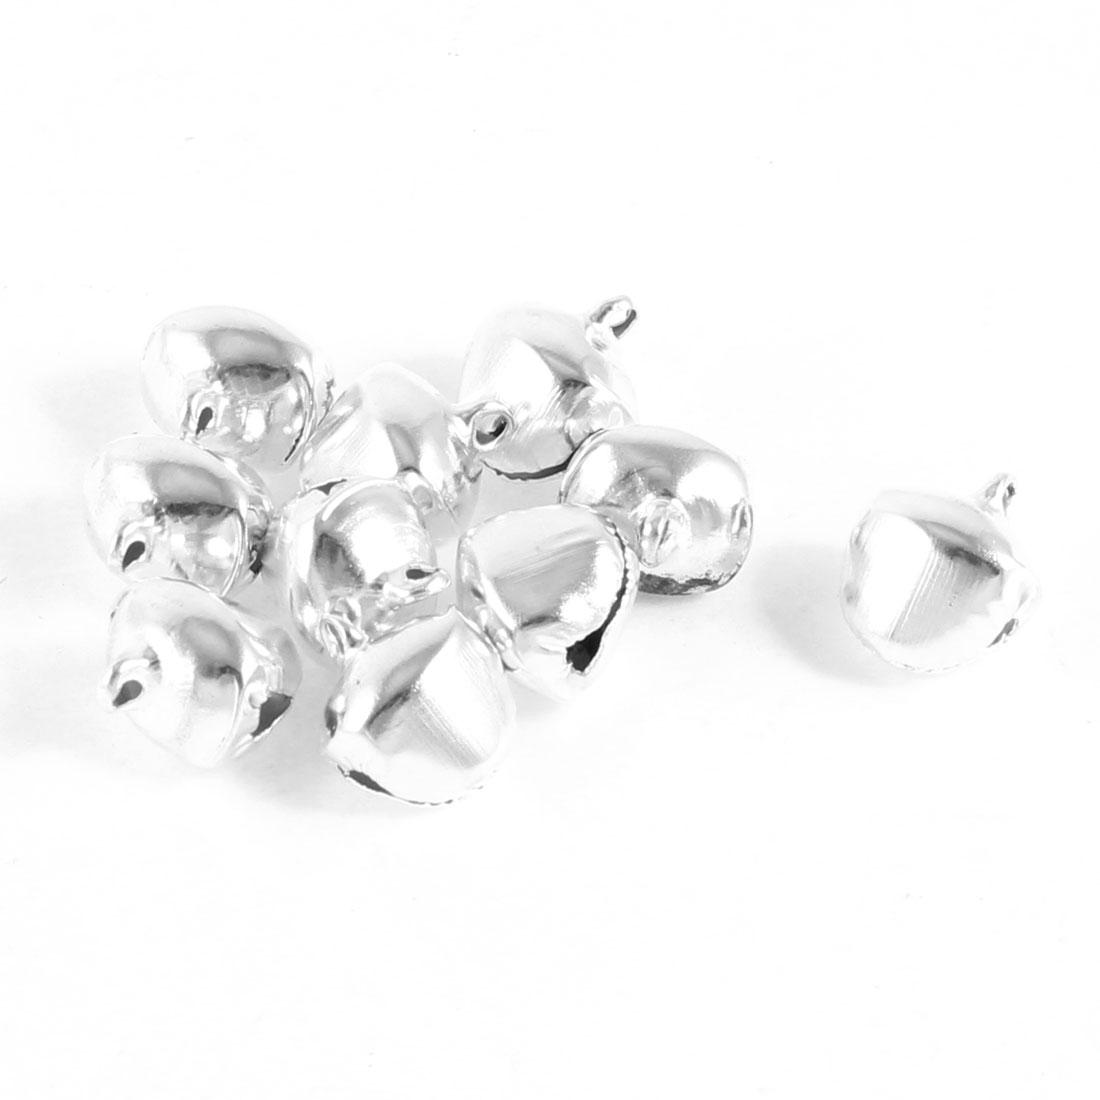 10 Pcs Xmas Tree Ornament Silver Tone Ring Bells 17mm Xmzic